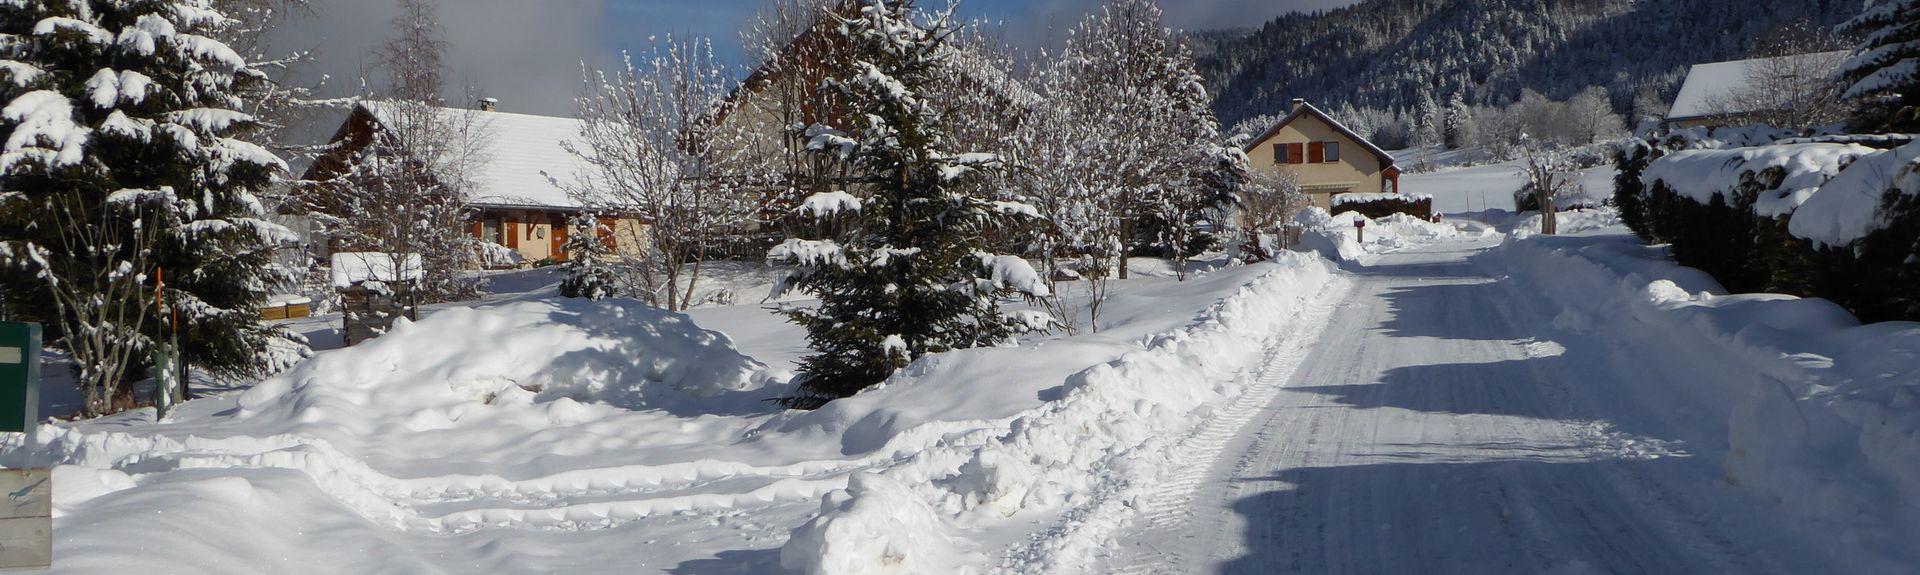 Saint-Martin-d'Hères, Auvernia-Ródano-Alpes, Francia